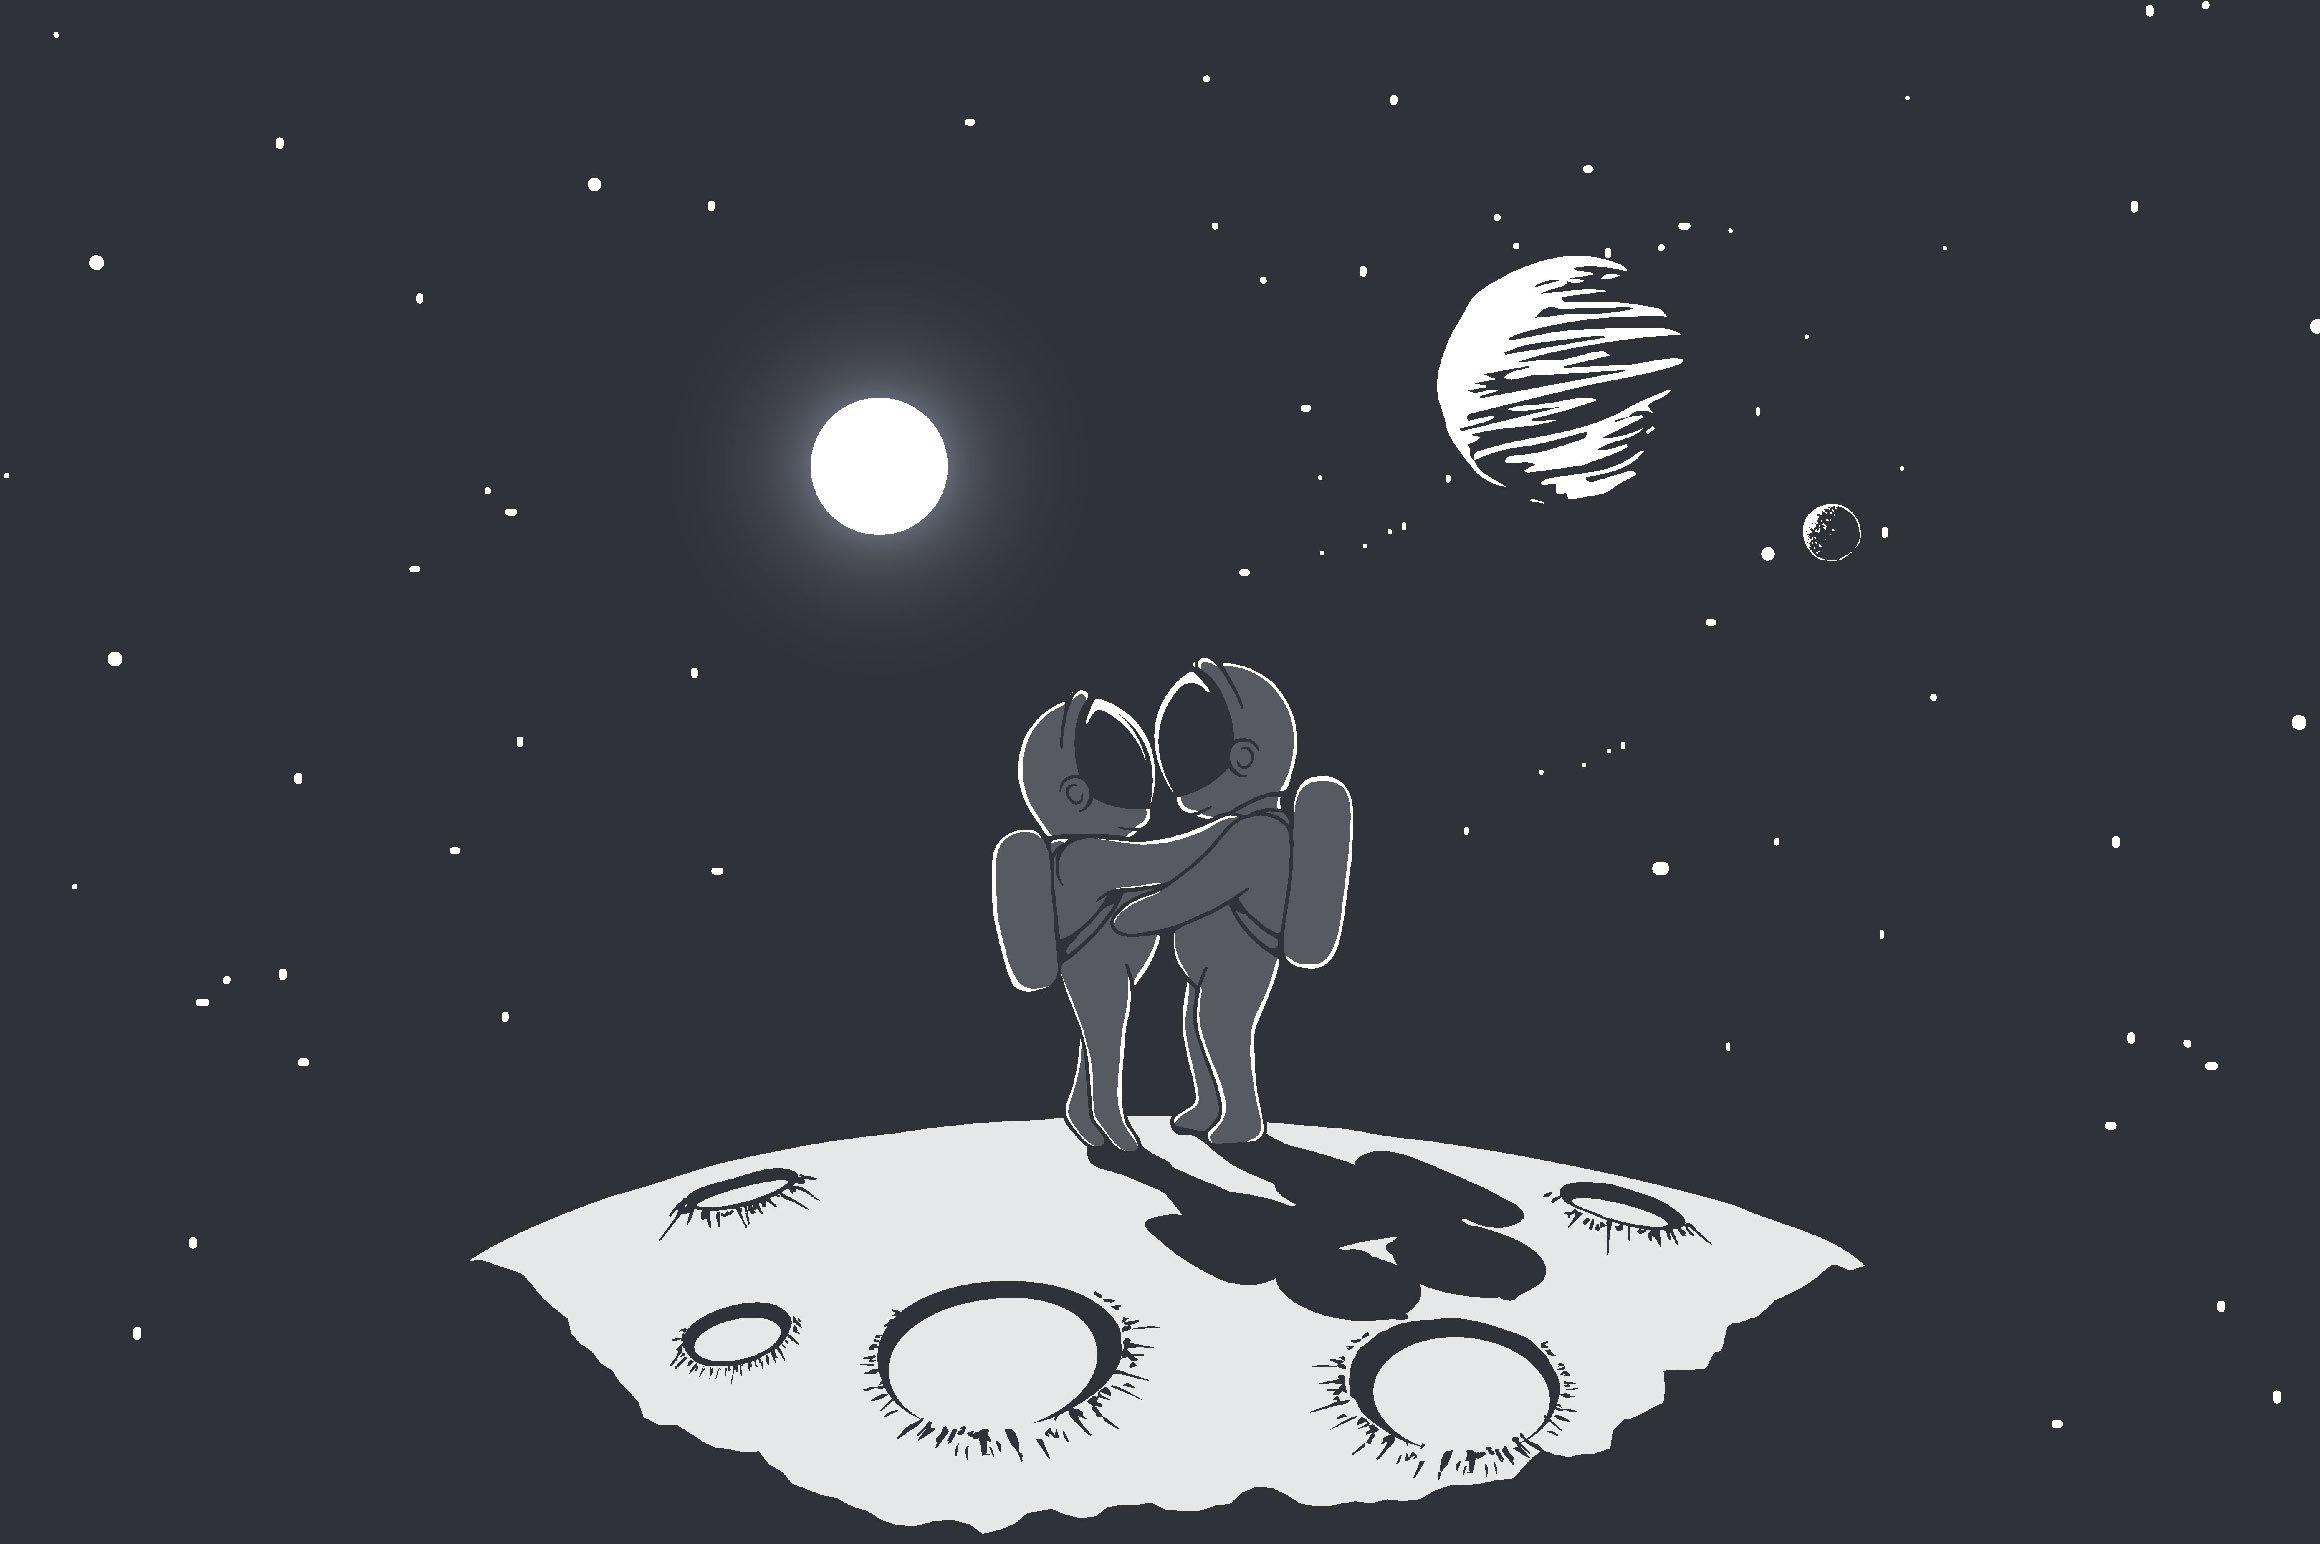 Space love ~ Illustrations ~ Creative Market